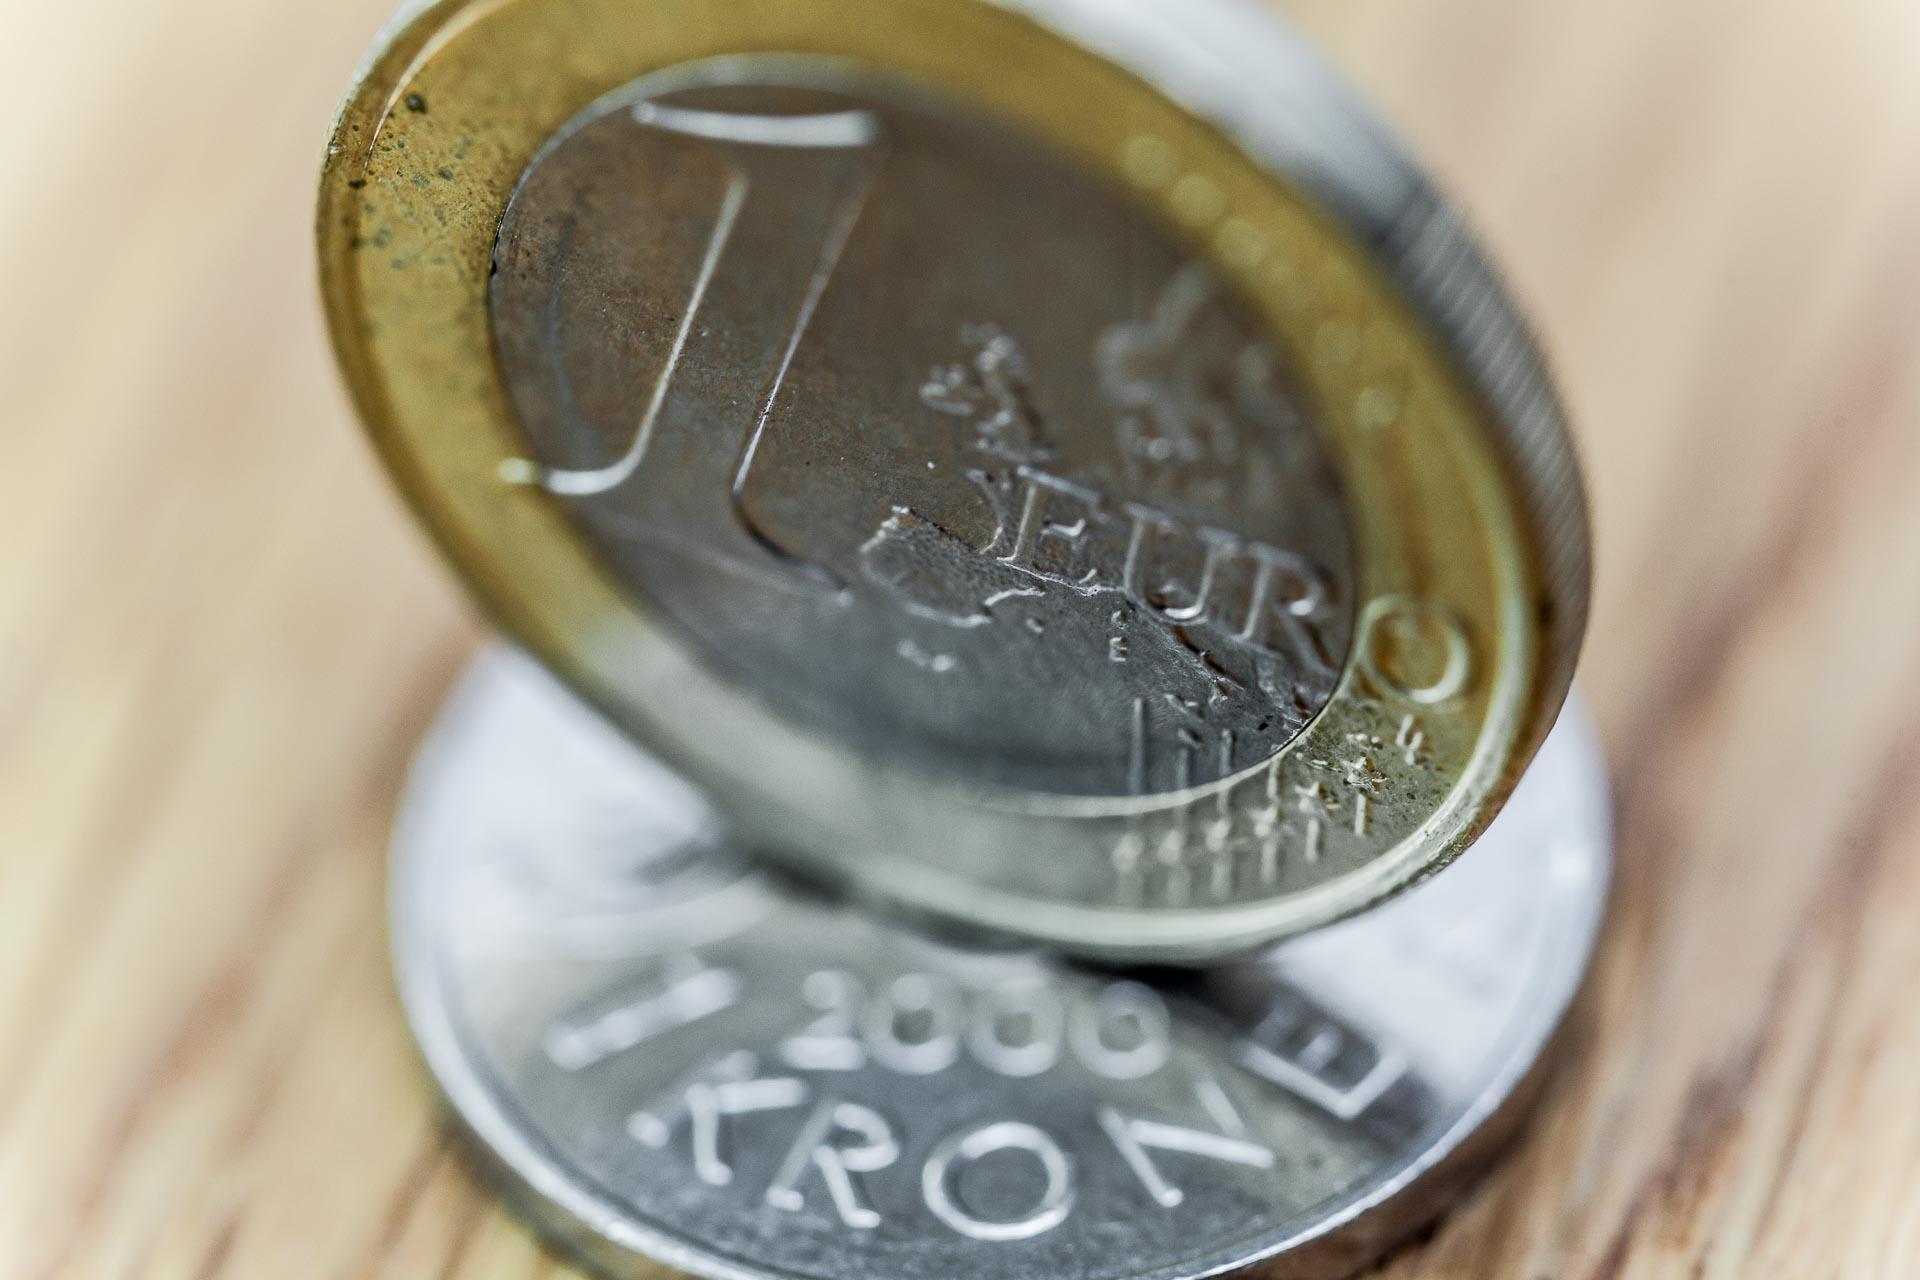 Aidas Norvegijoje (Euro over norsk krone)